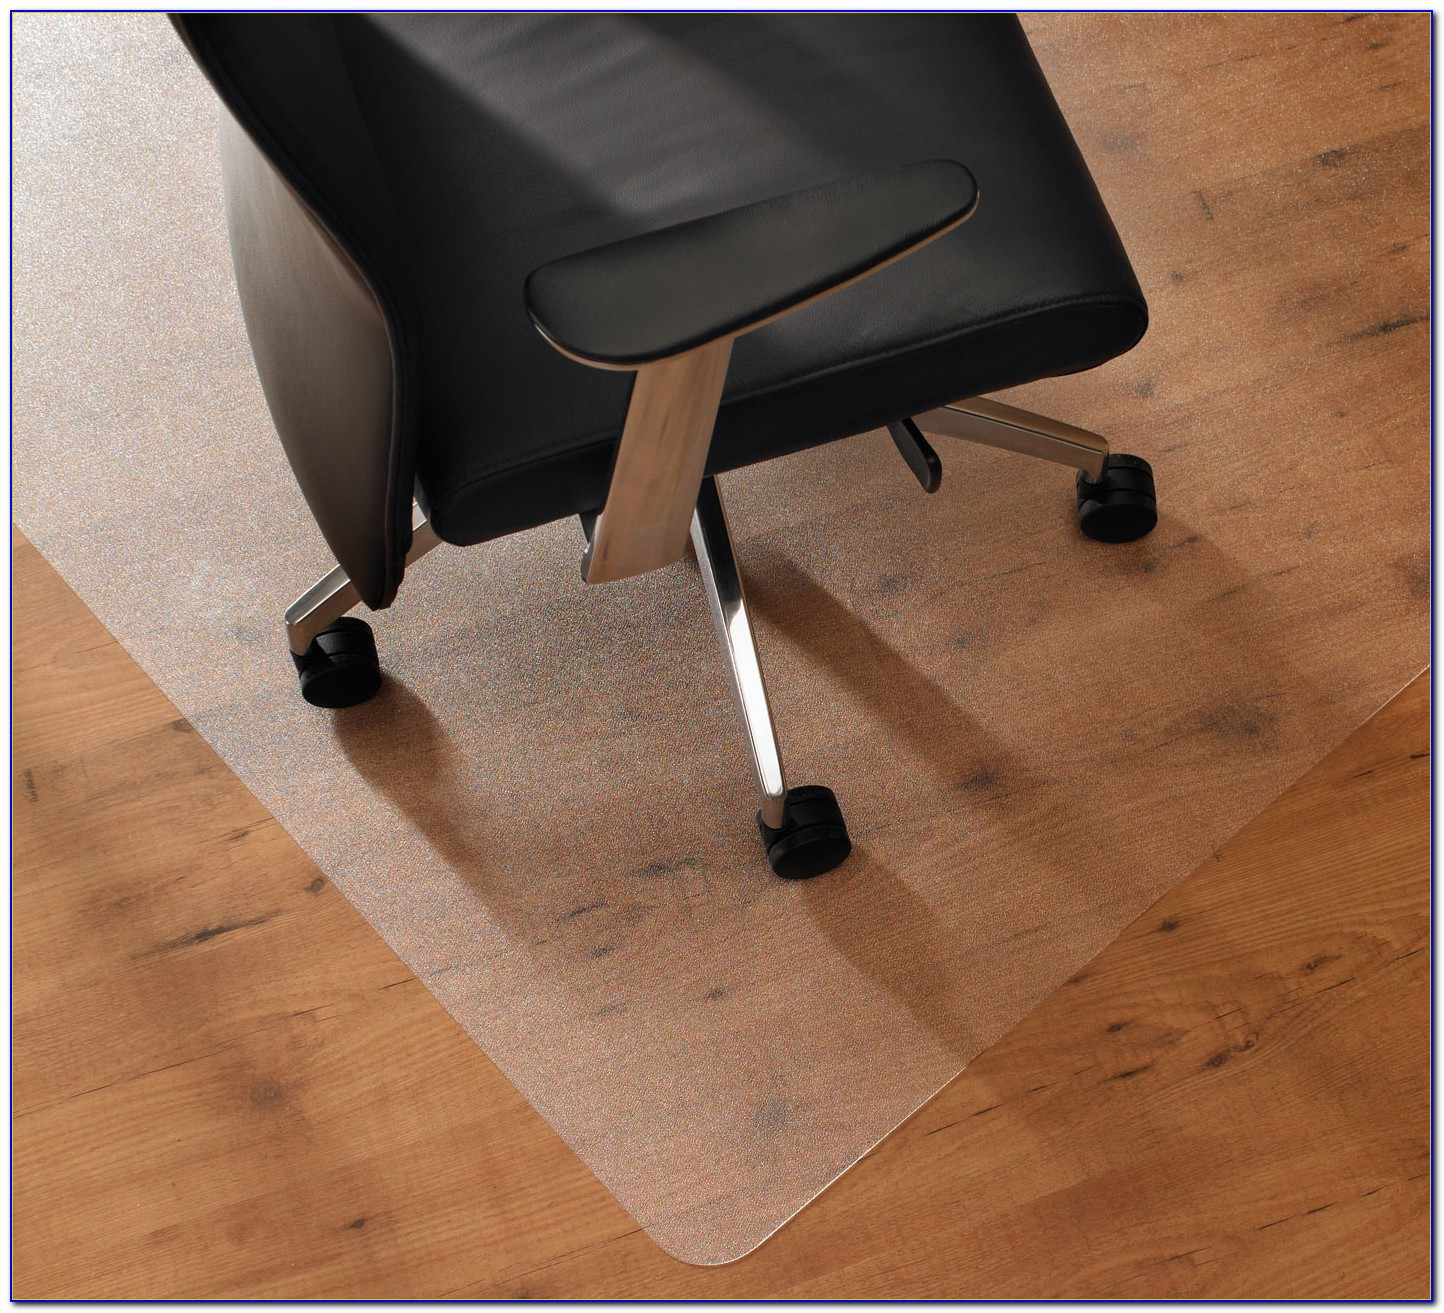 Hardwood Floor Protectors For Chairs